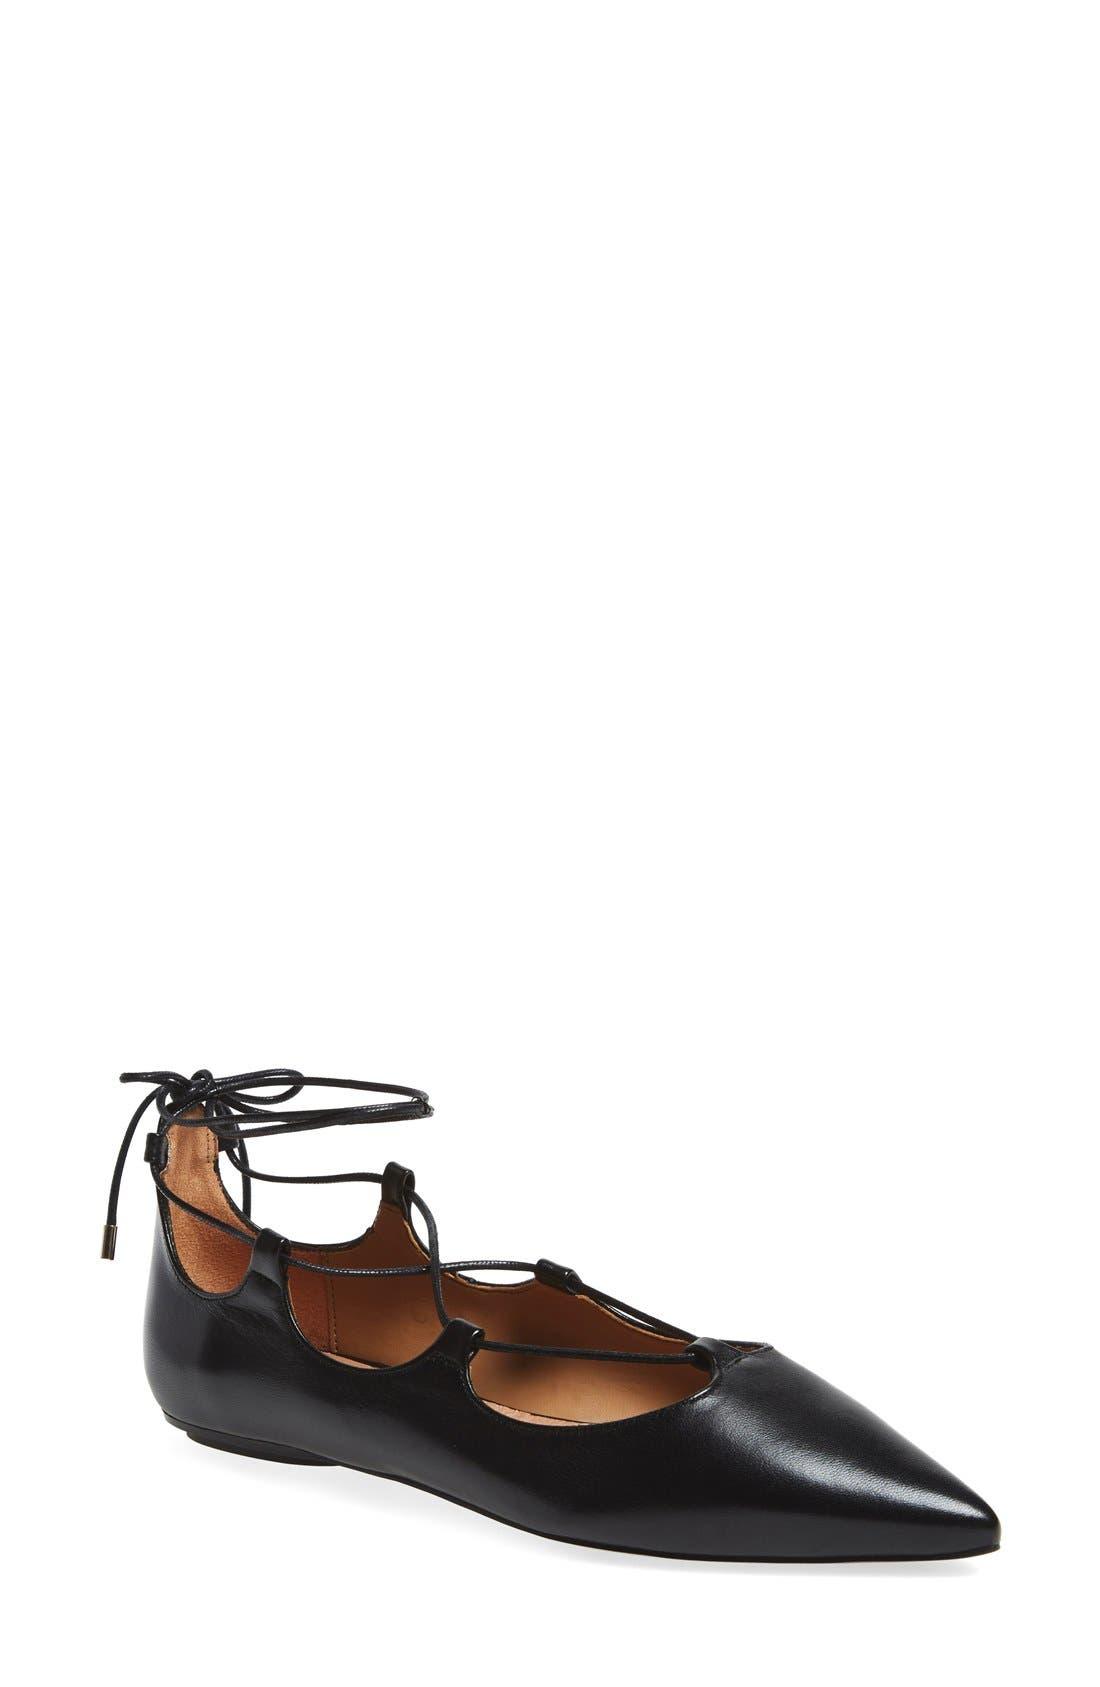 'Leather Kingdom' Pointy Toe Flat, Main, color, 001